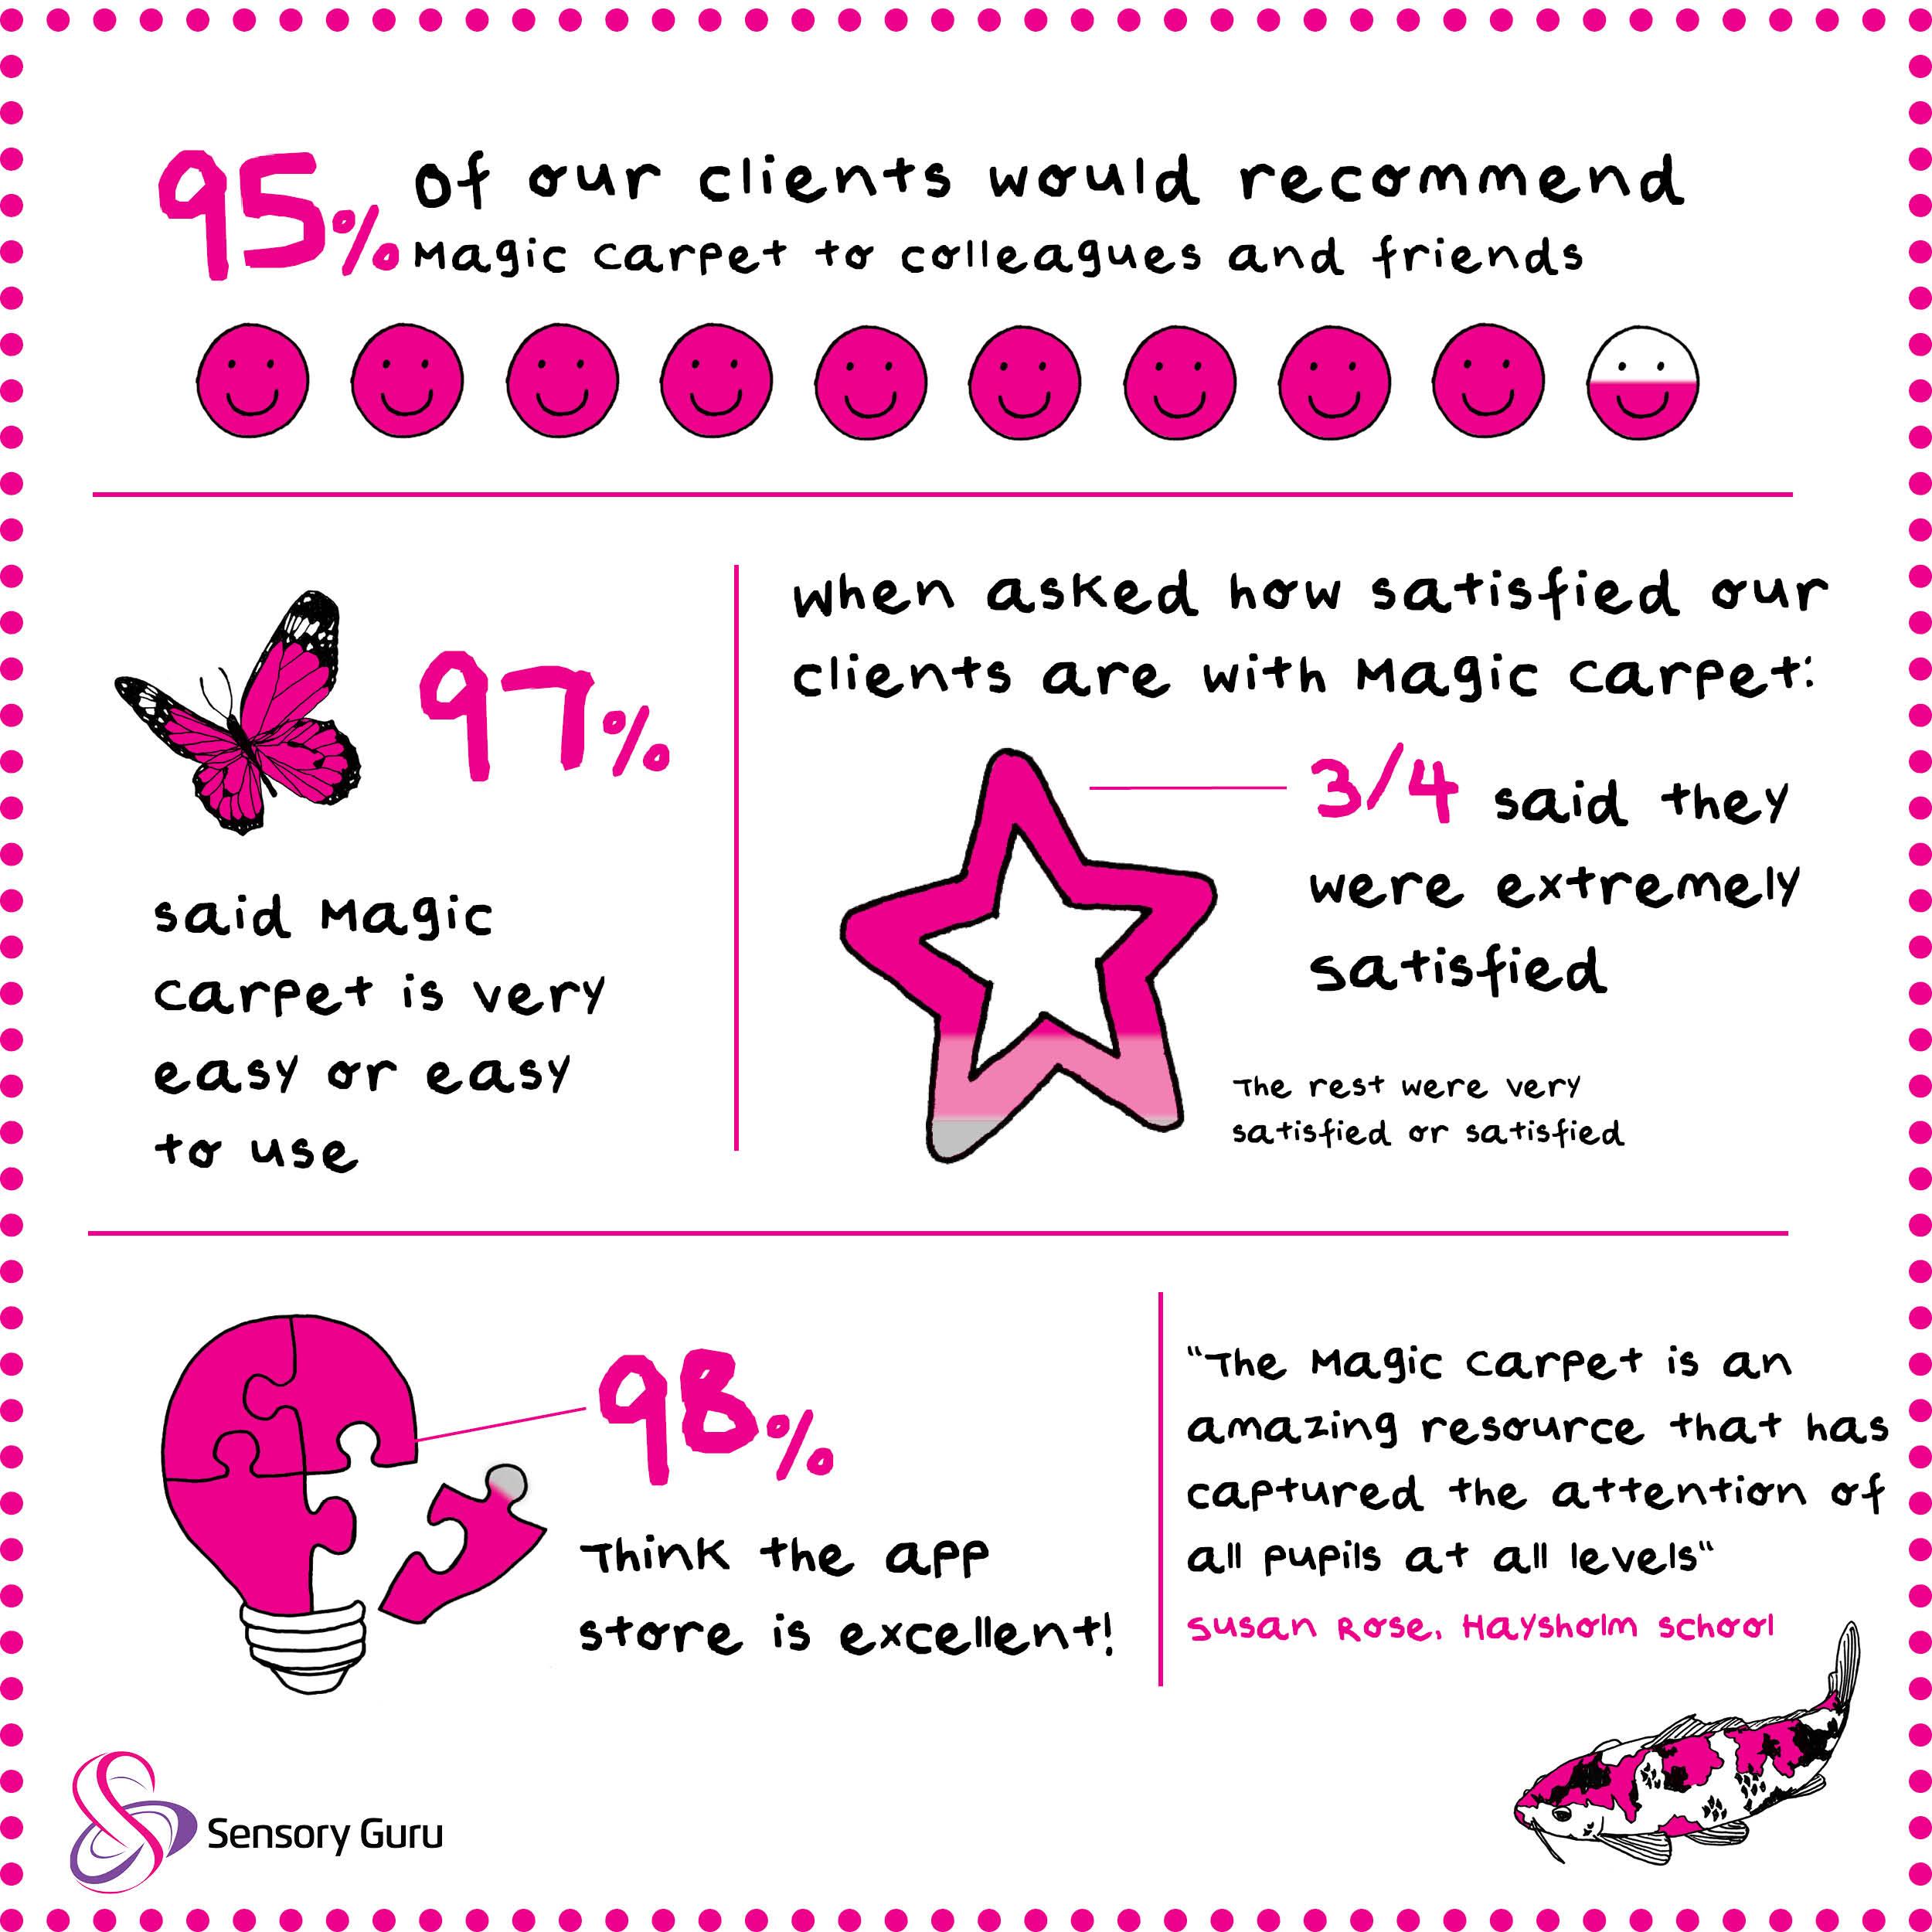 Infographic, Sensory Guru, App store, Magic Carpet